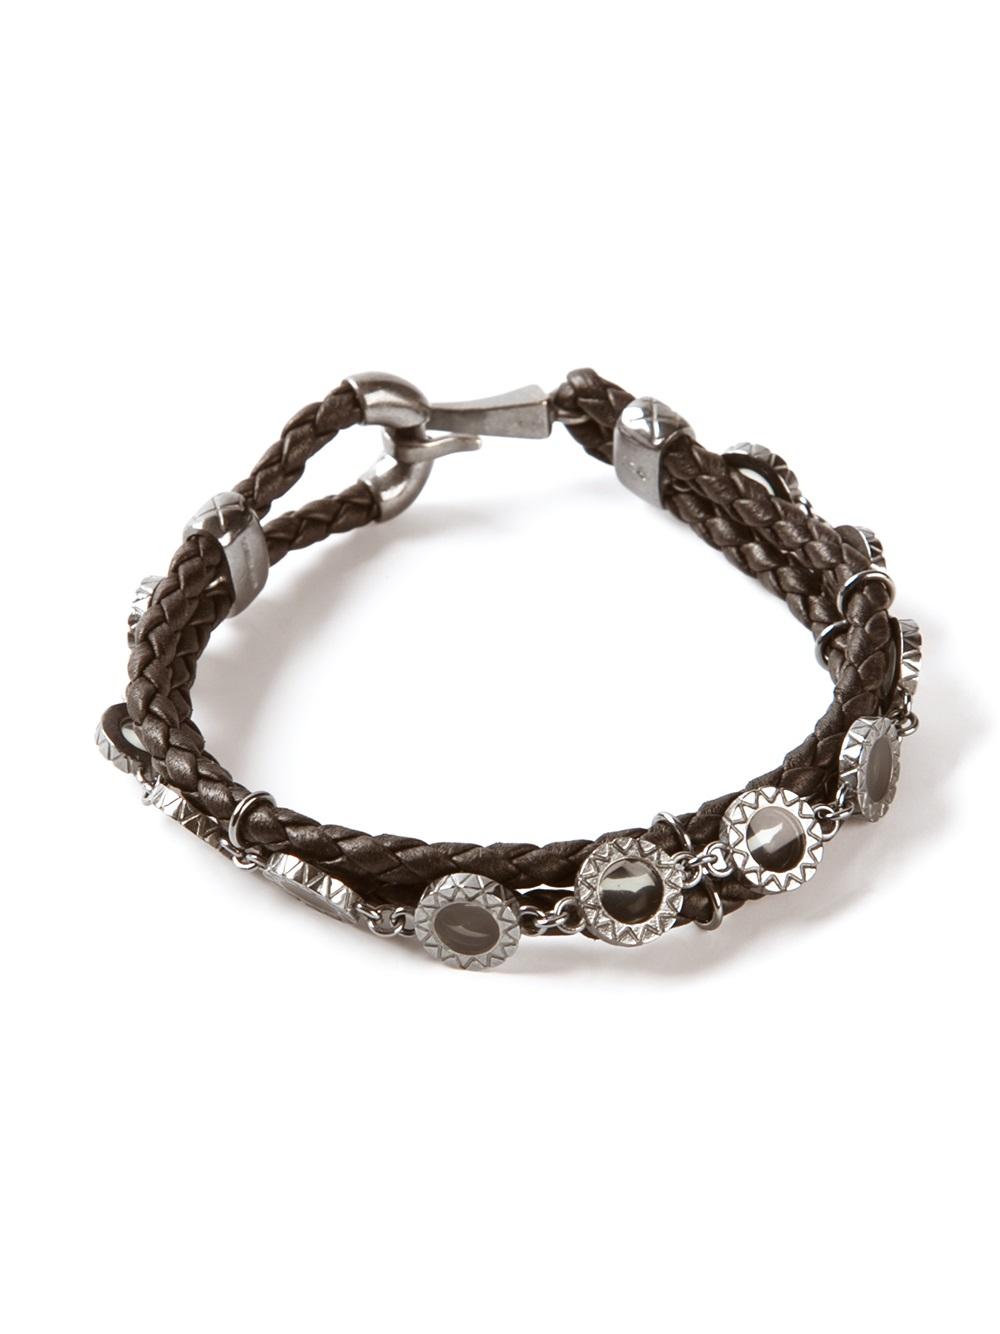 b6731bff534b3 Bottega Veneta Bracelet Blue. Lyst - Bottega Veneta Chain Embellished Intrecciato  Bracelet in Brown for Men